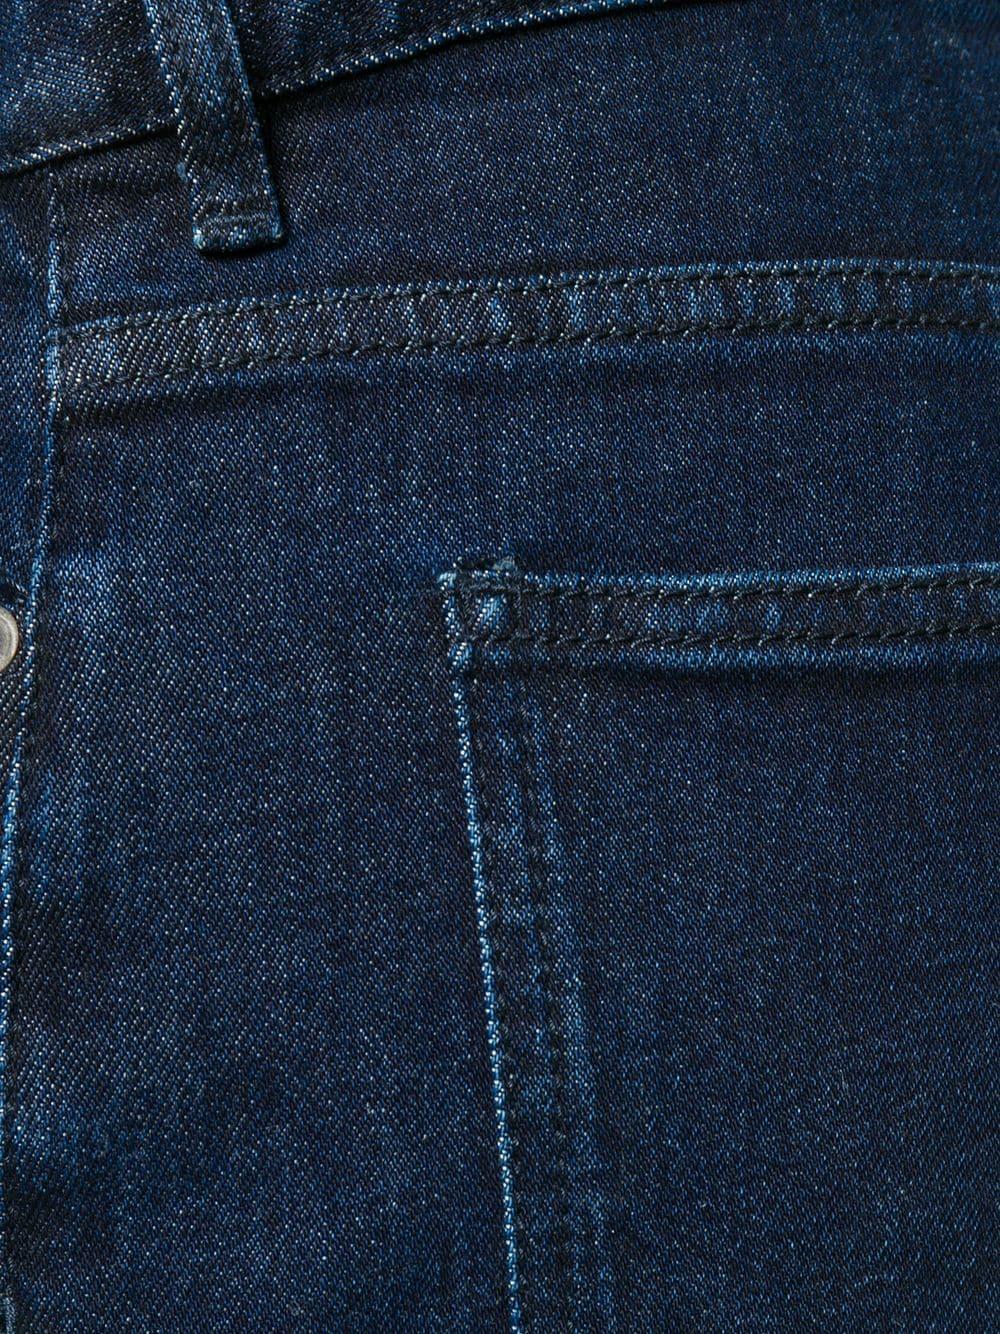 Maison Margiela   Maison Margiela классические джинсы   Clouty